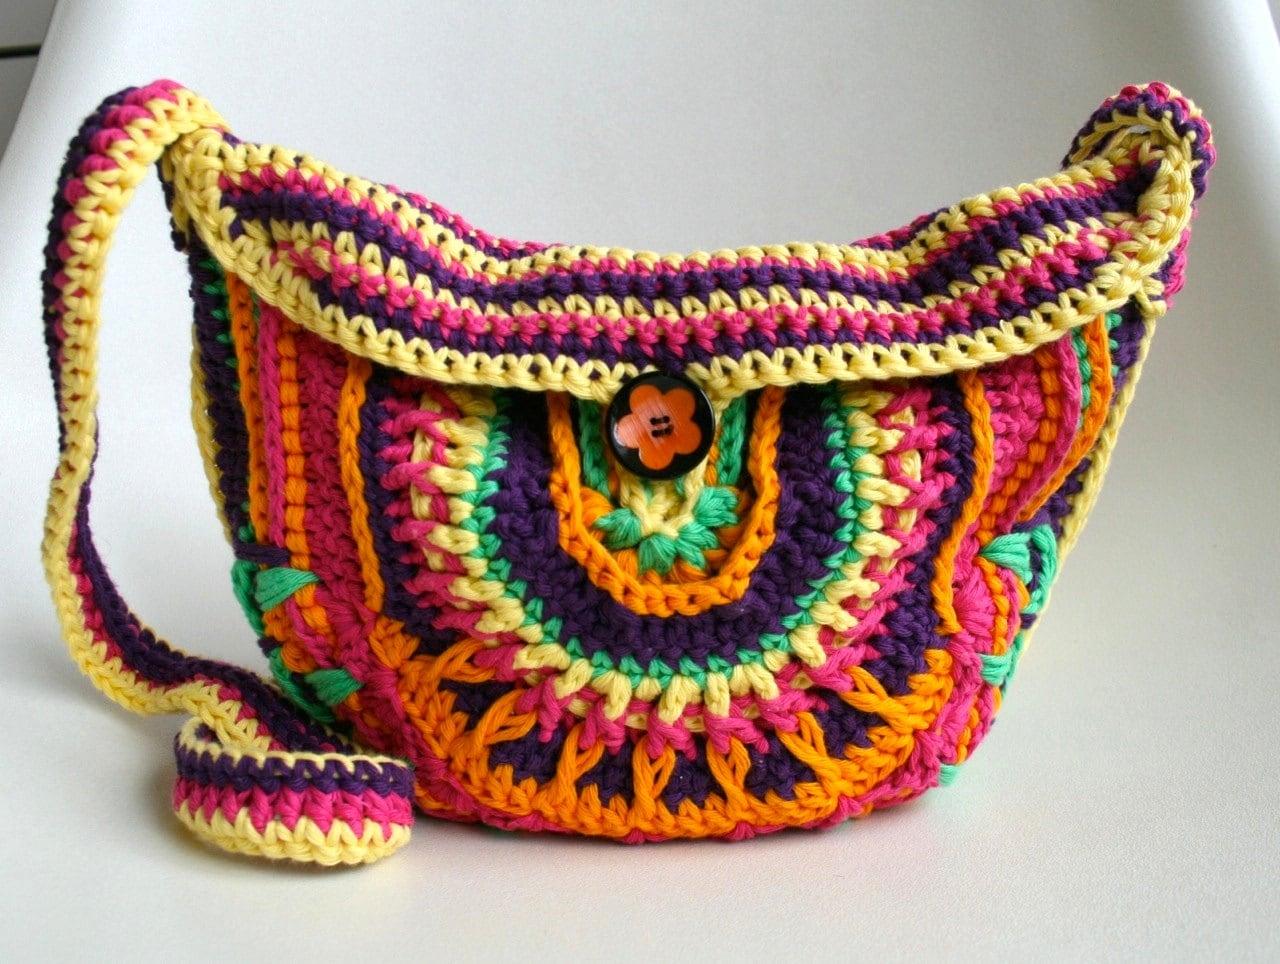 Crochet patterns, 3 crochet purse patterns sale, crochet mandala ...